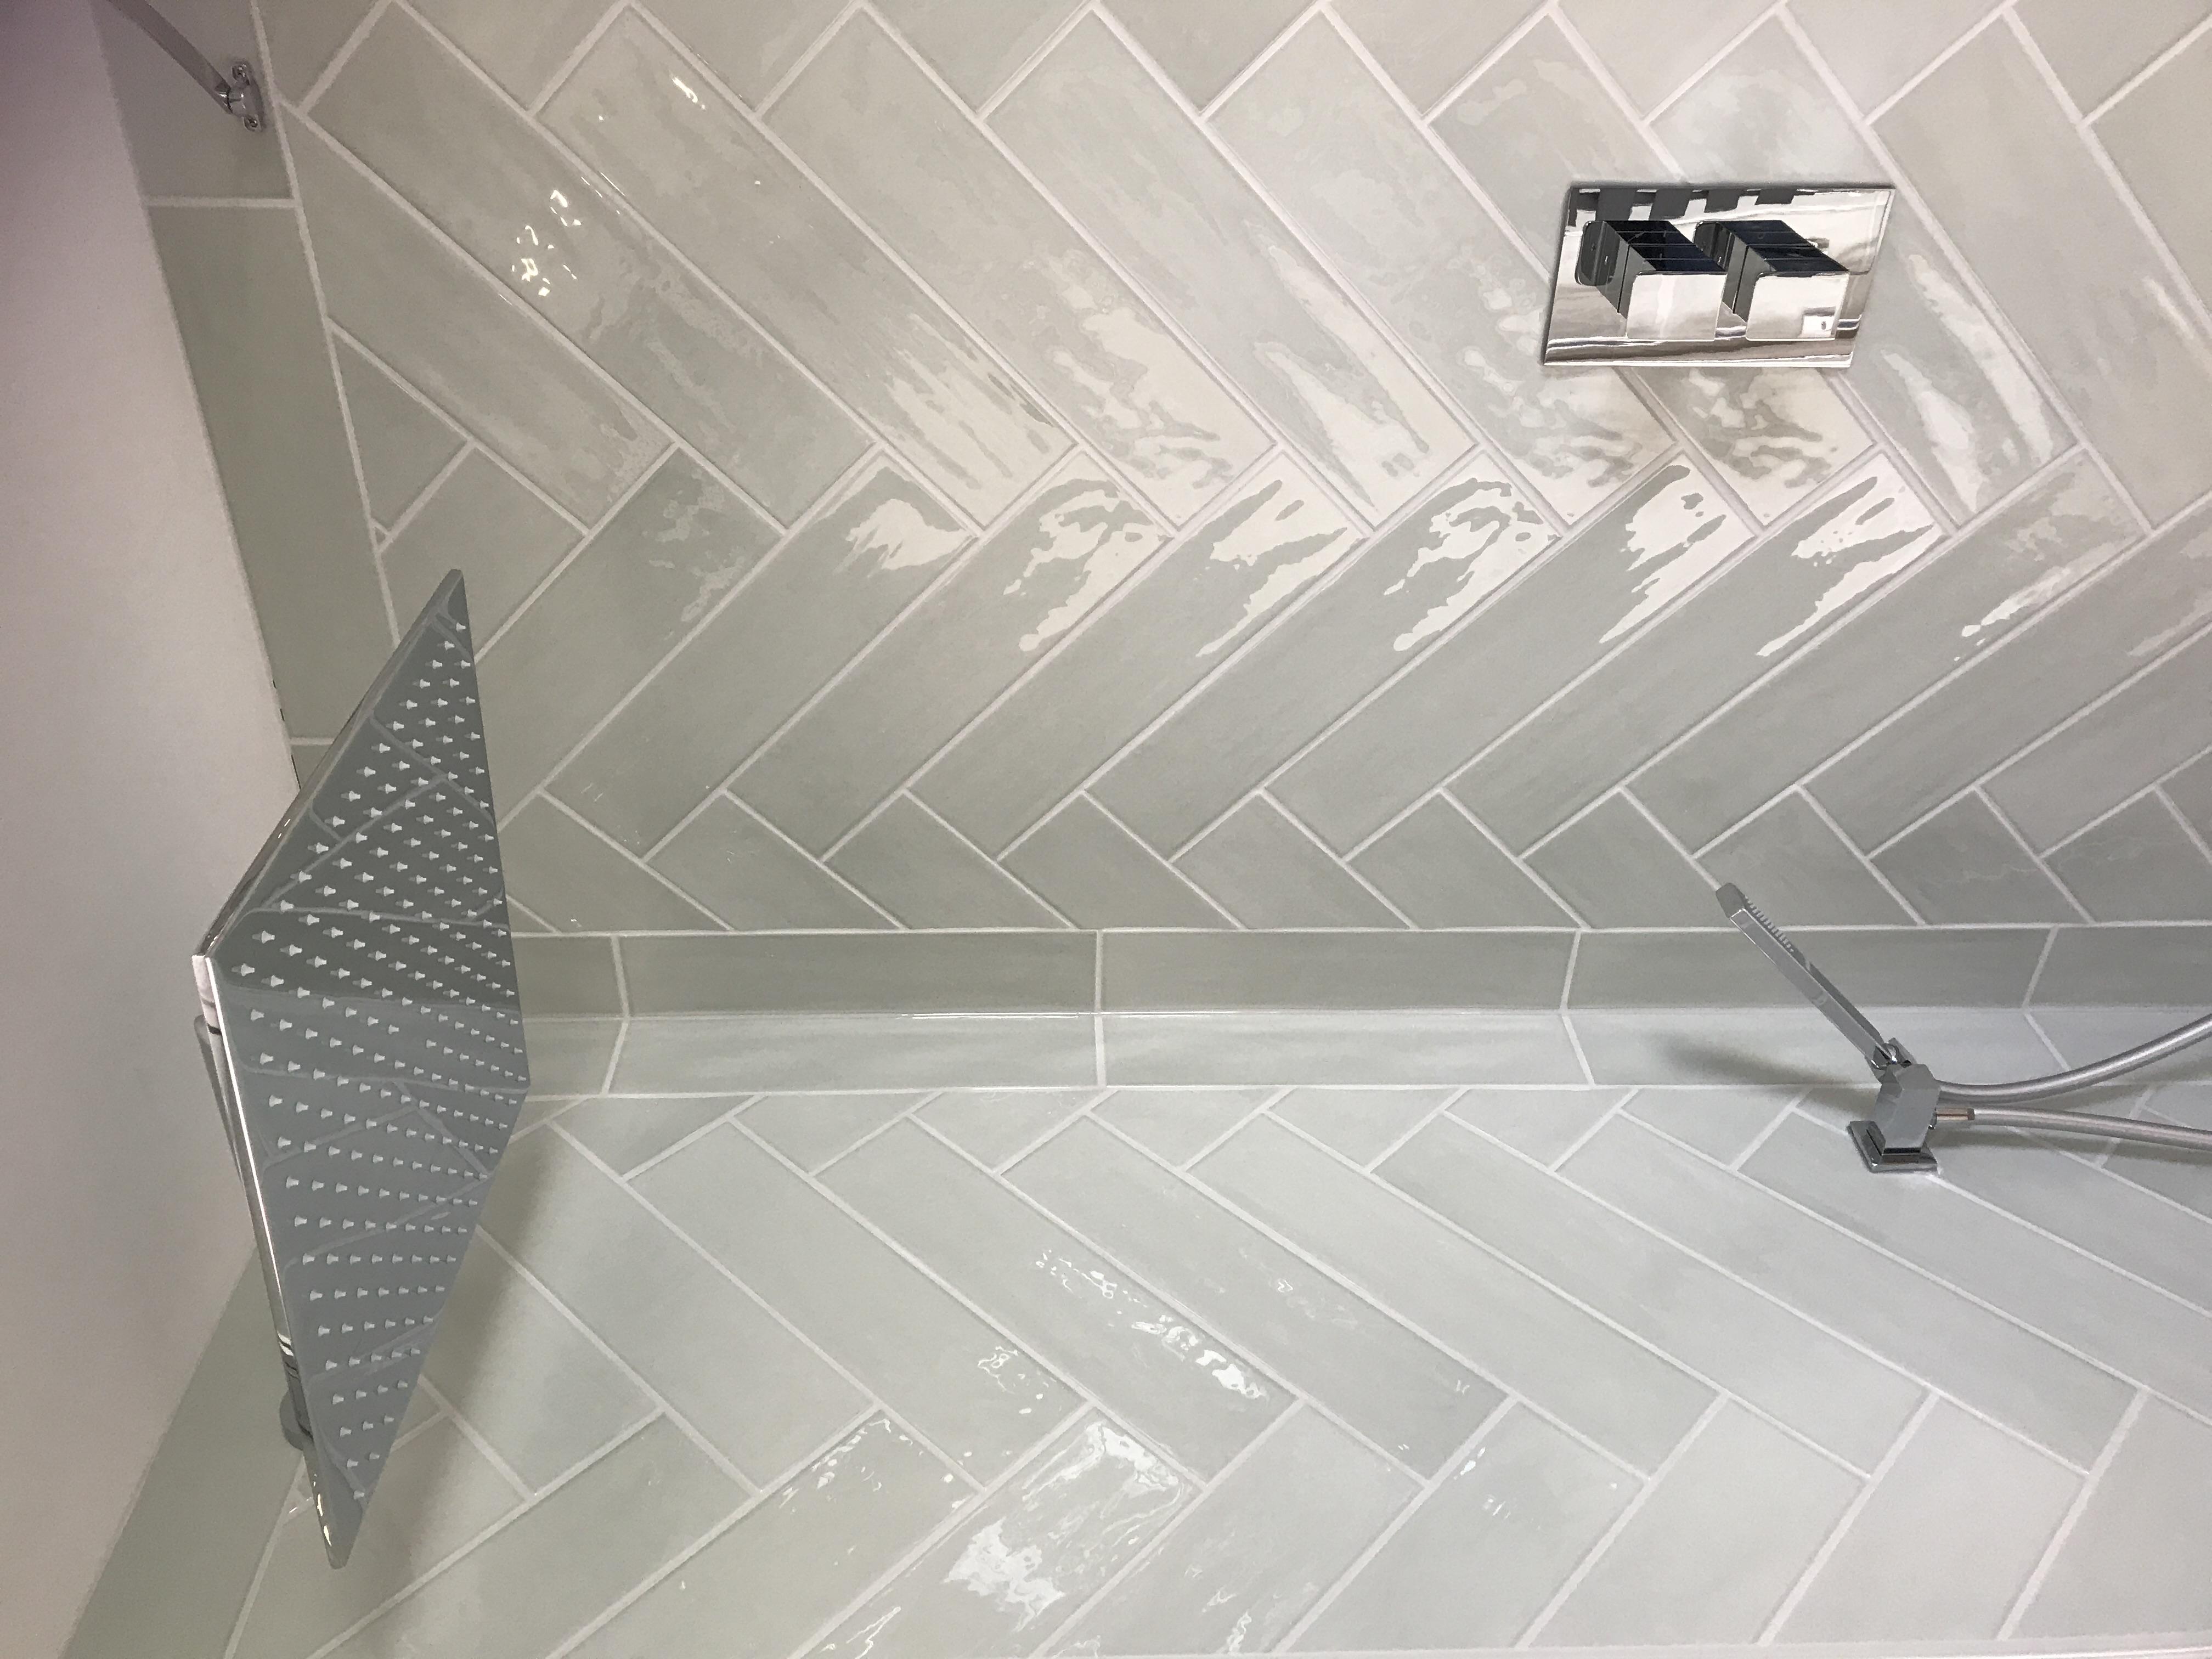 Bay Master bathroom raindrop shower